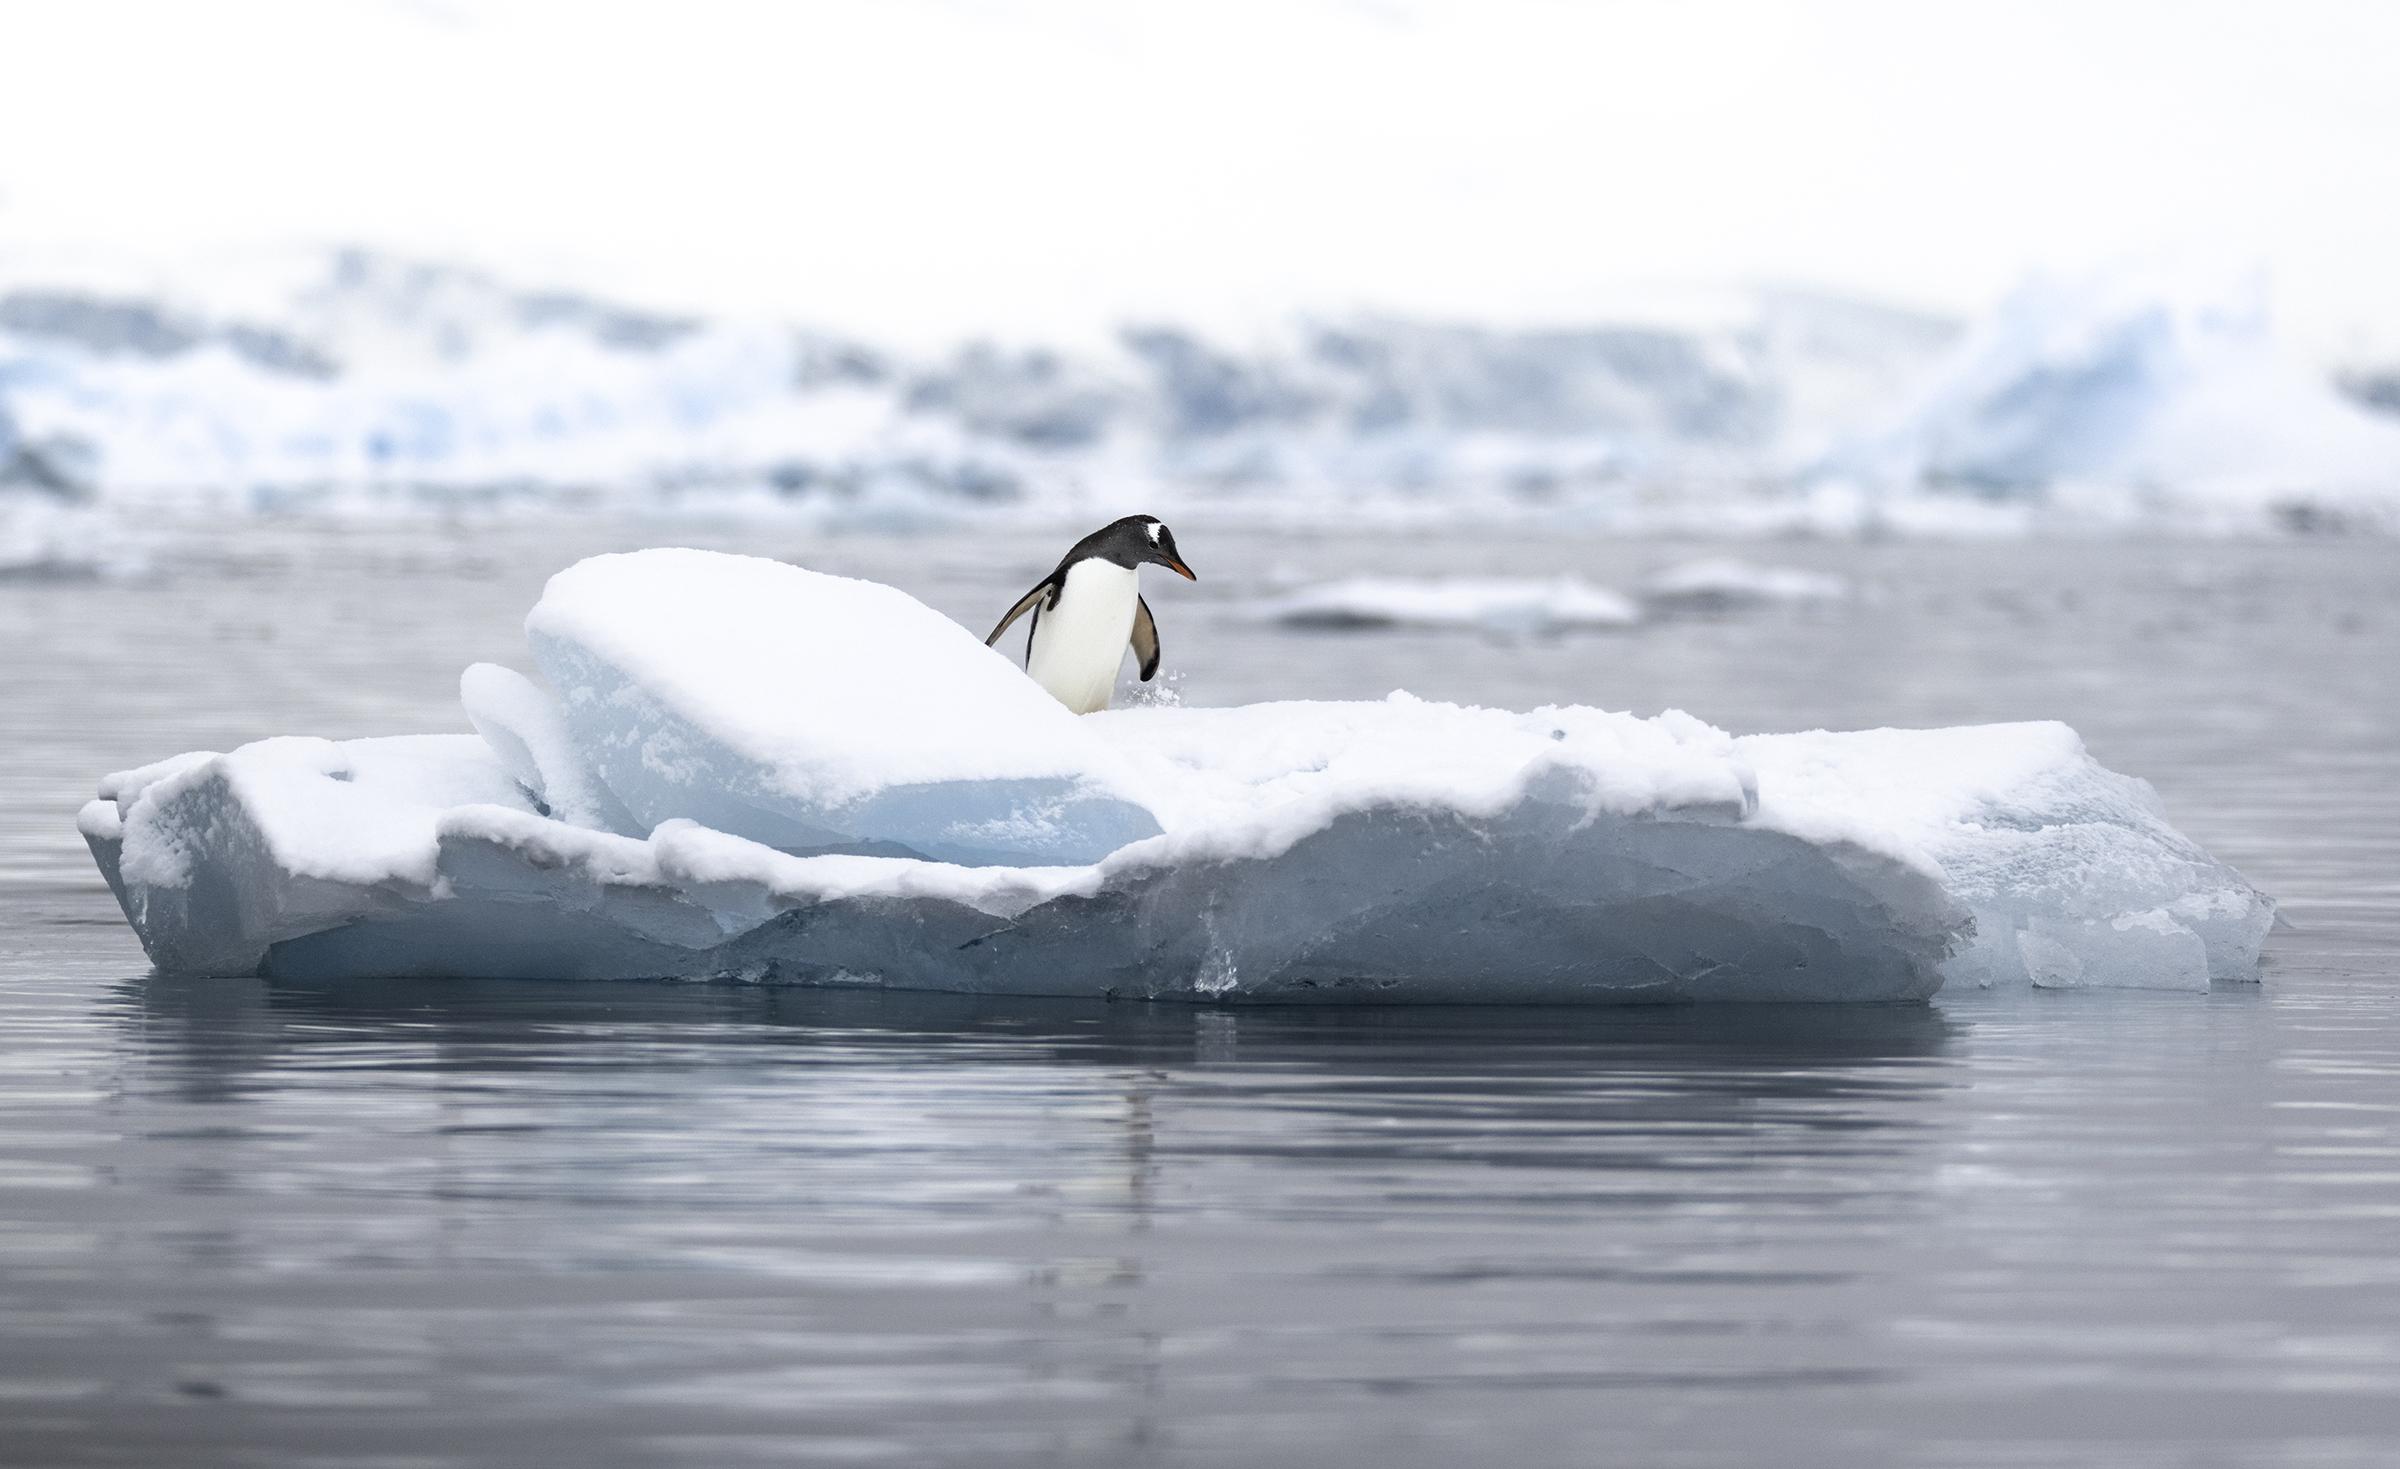 gentoo penguin on iceberg.jpg